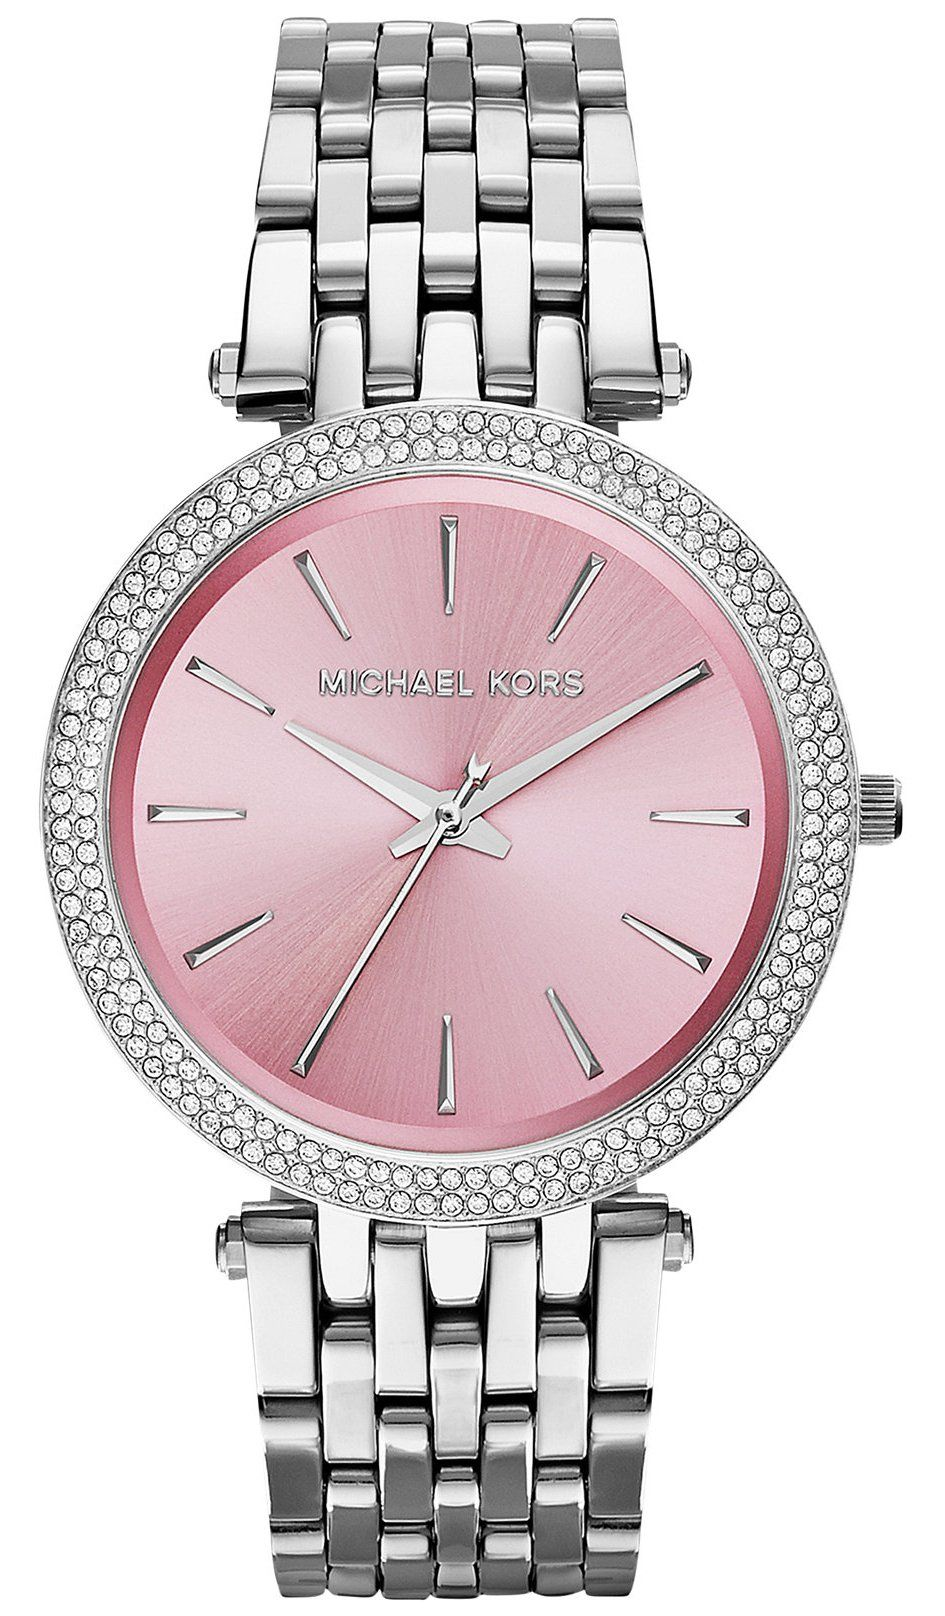 Michael Kors Watches Darci Watch (Silver)  4e5e436b3e